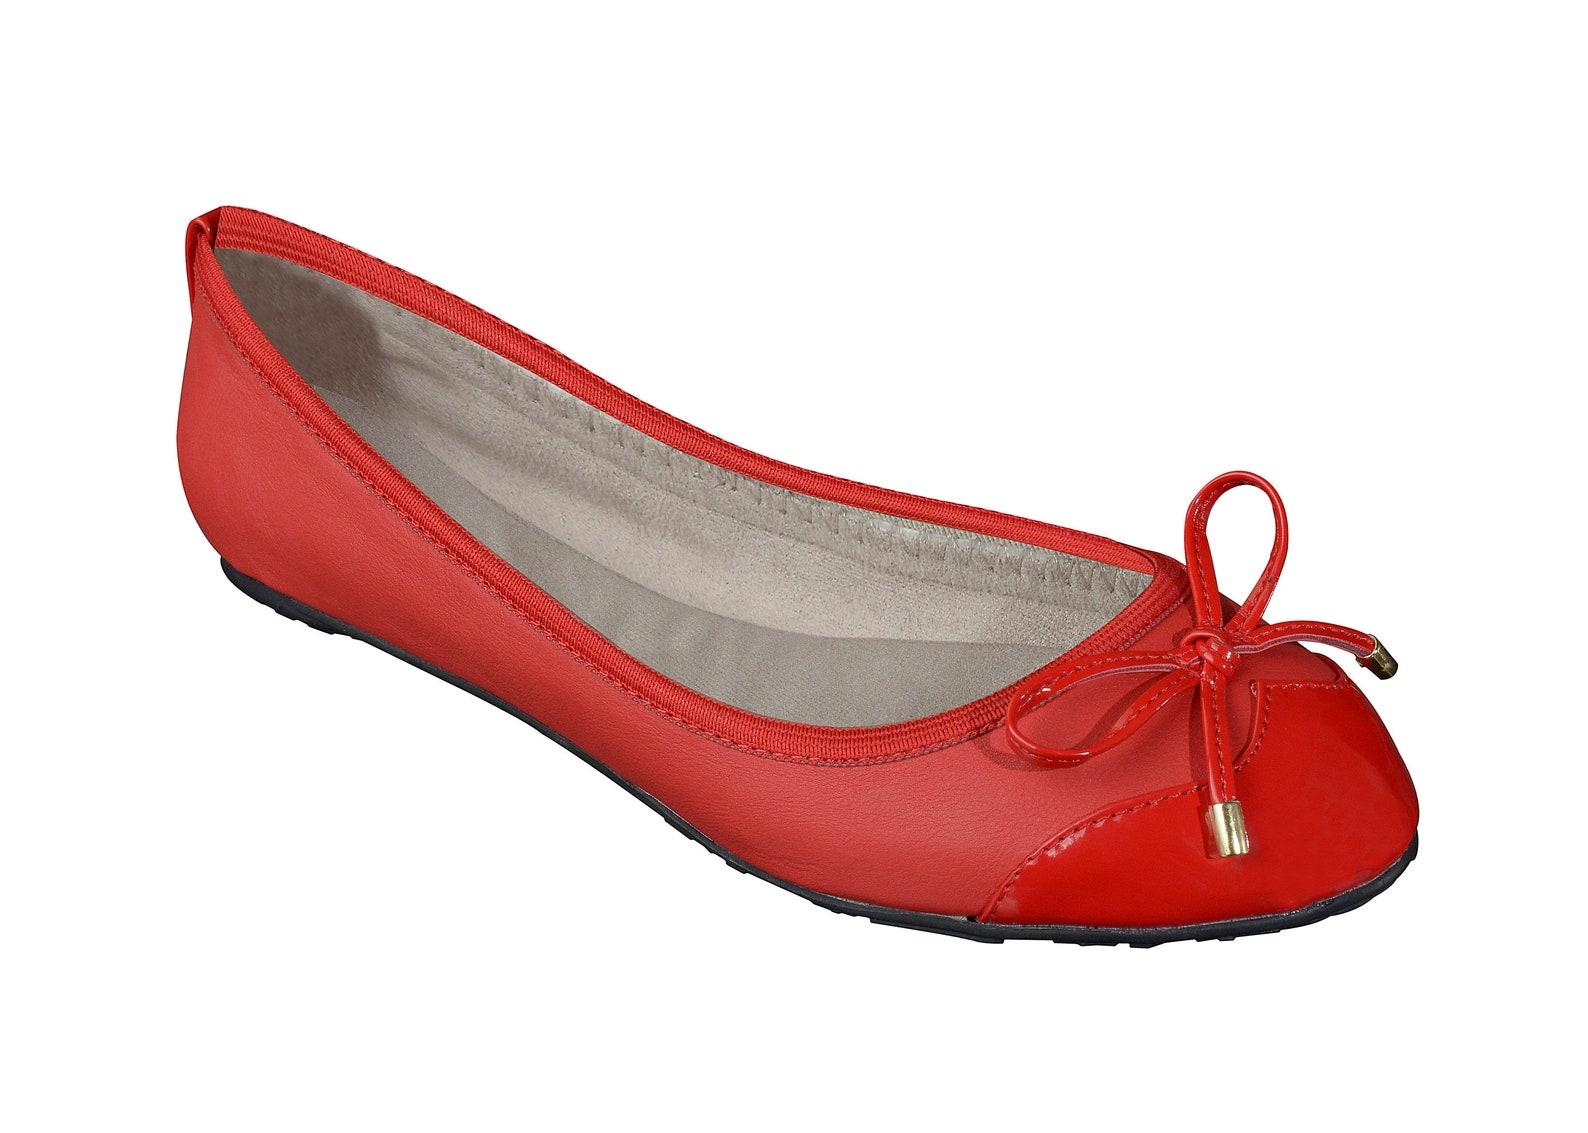 foldable ballet flats - red ballet flats, wedding flats, bridal party gifts, bridal flats, wedding shoes, bridesmaid gift, gift